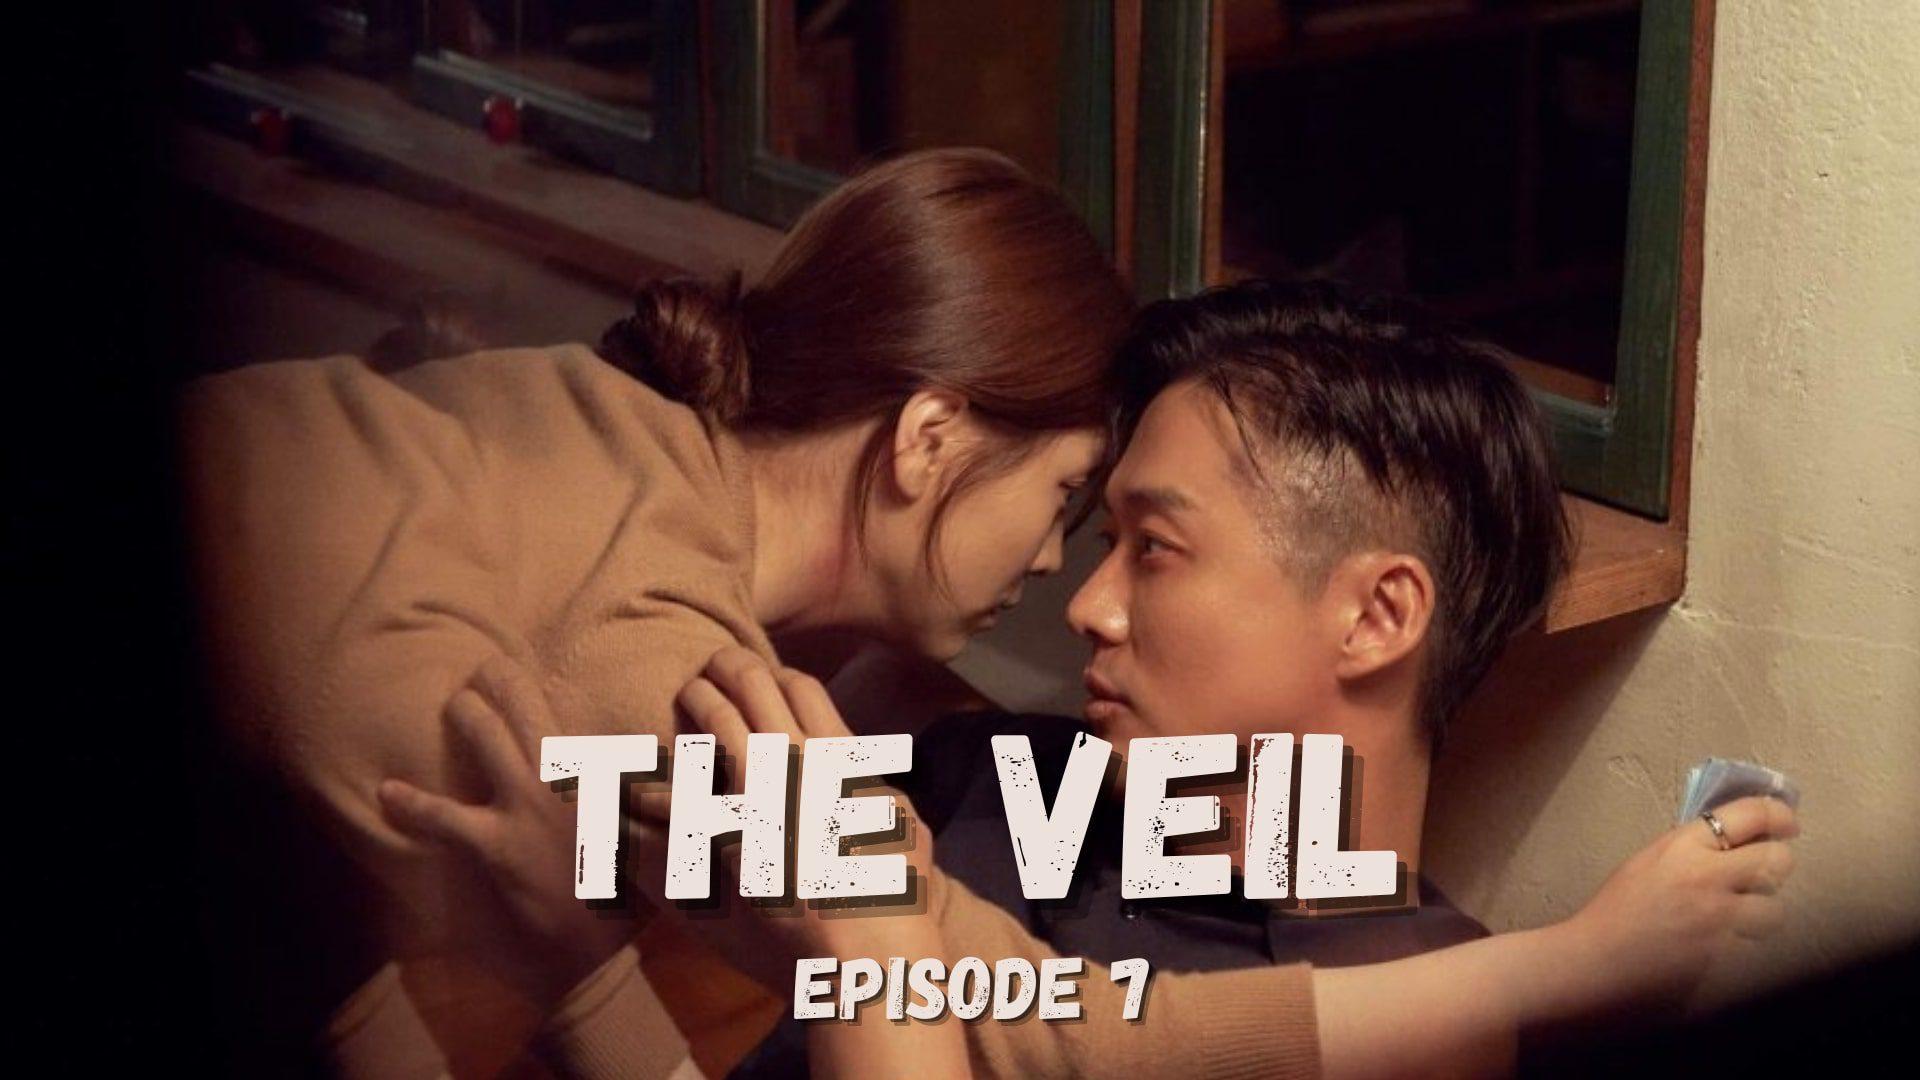 The Veil Episode 7